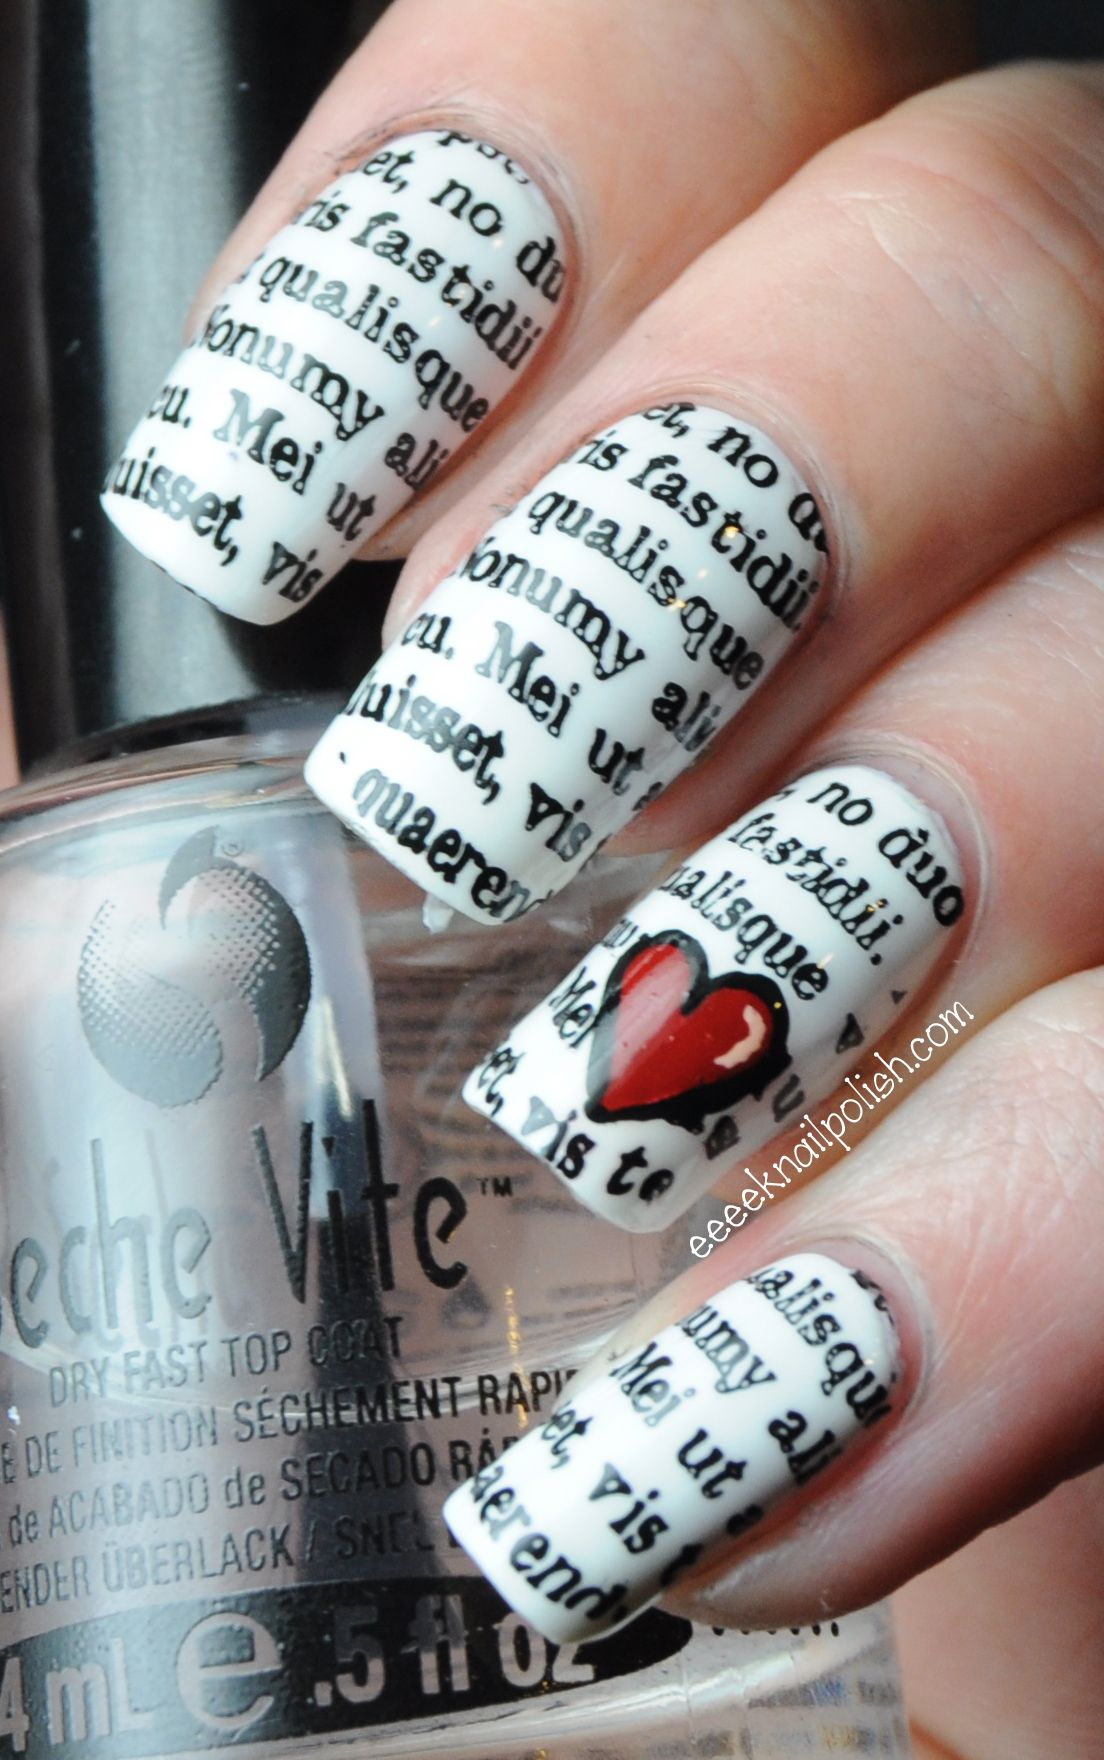 Appliqué news print and heart detail   Notable Nails   Pinterest ...